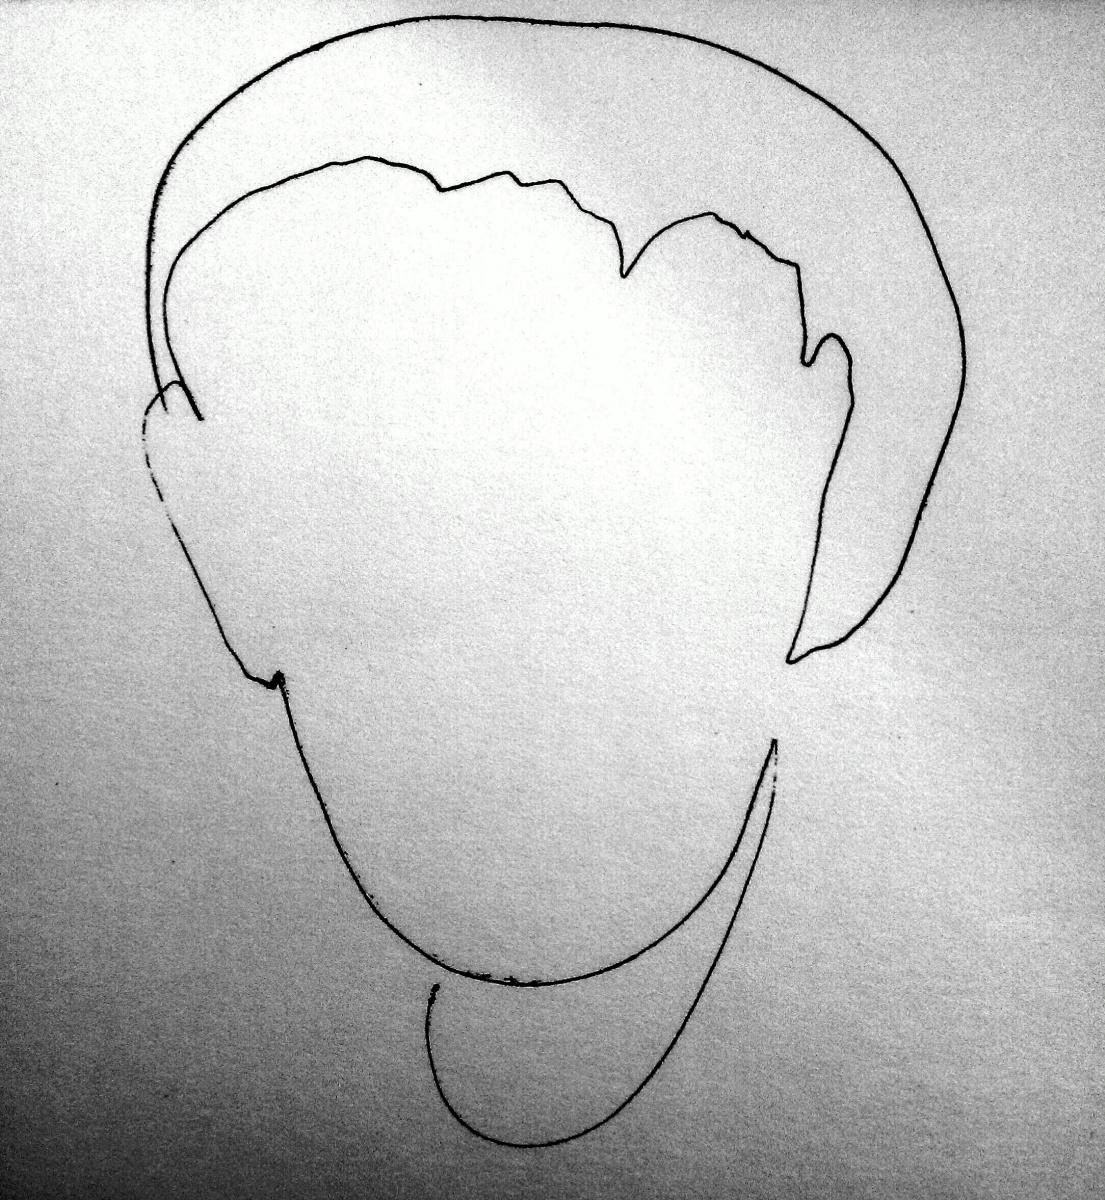 Krbtv _dm. Portrait in one striped. Self portrait